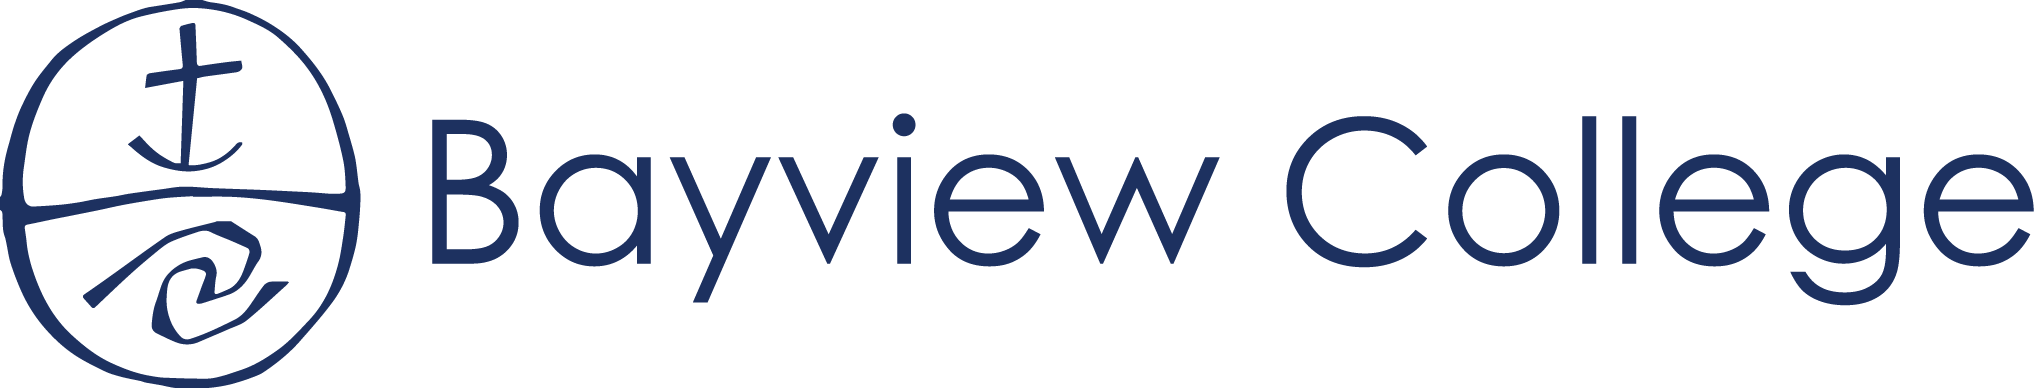 Bayview College Portal